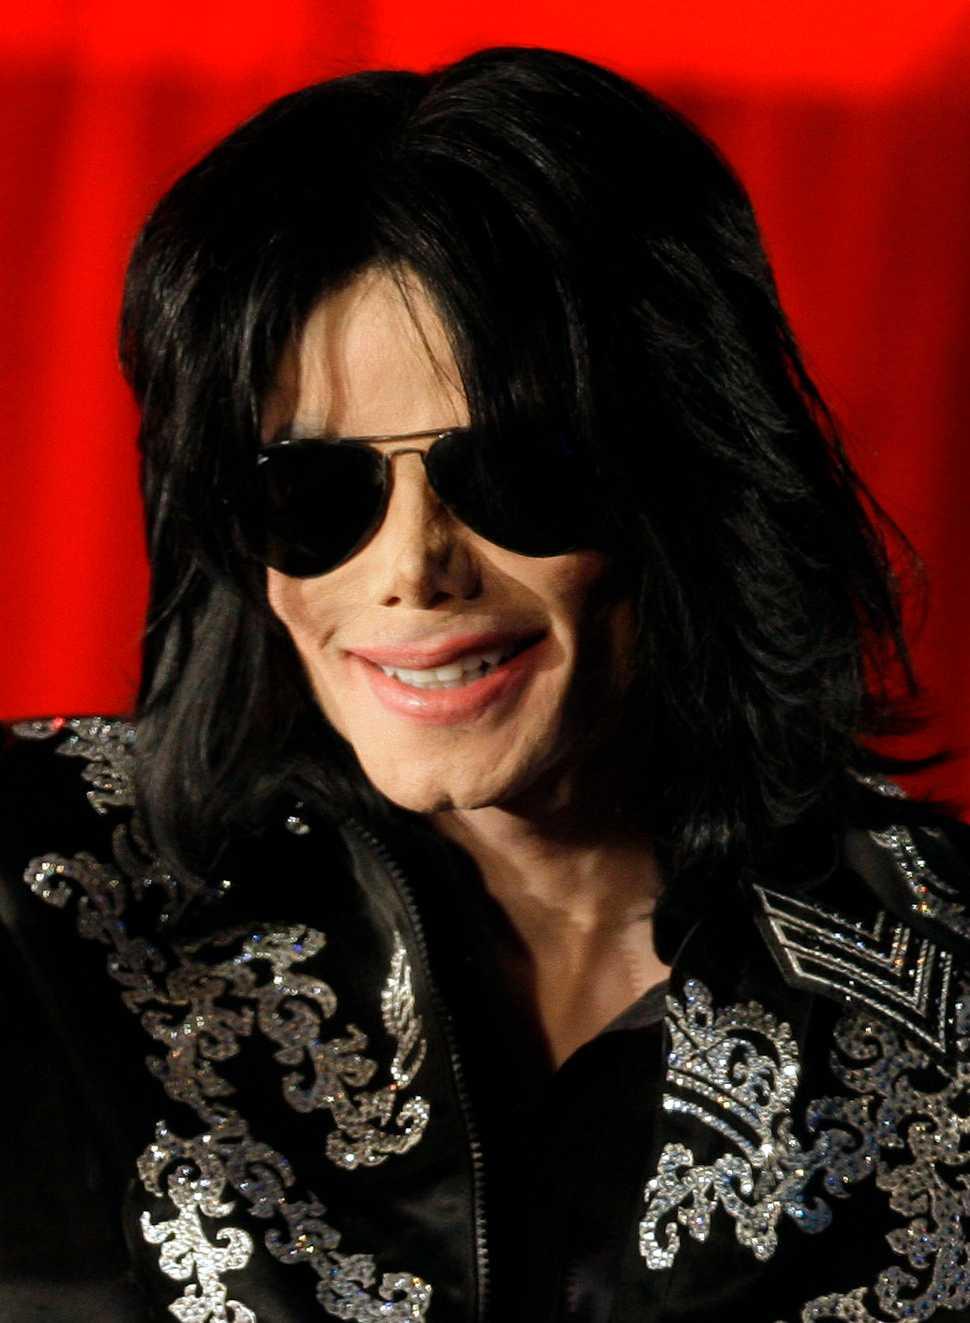 Micael Jackson 2009.